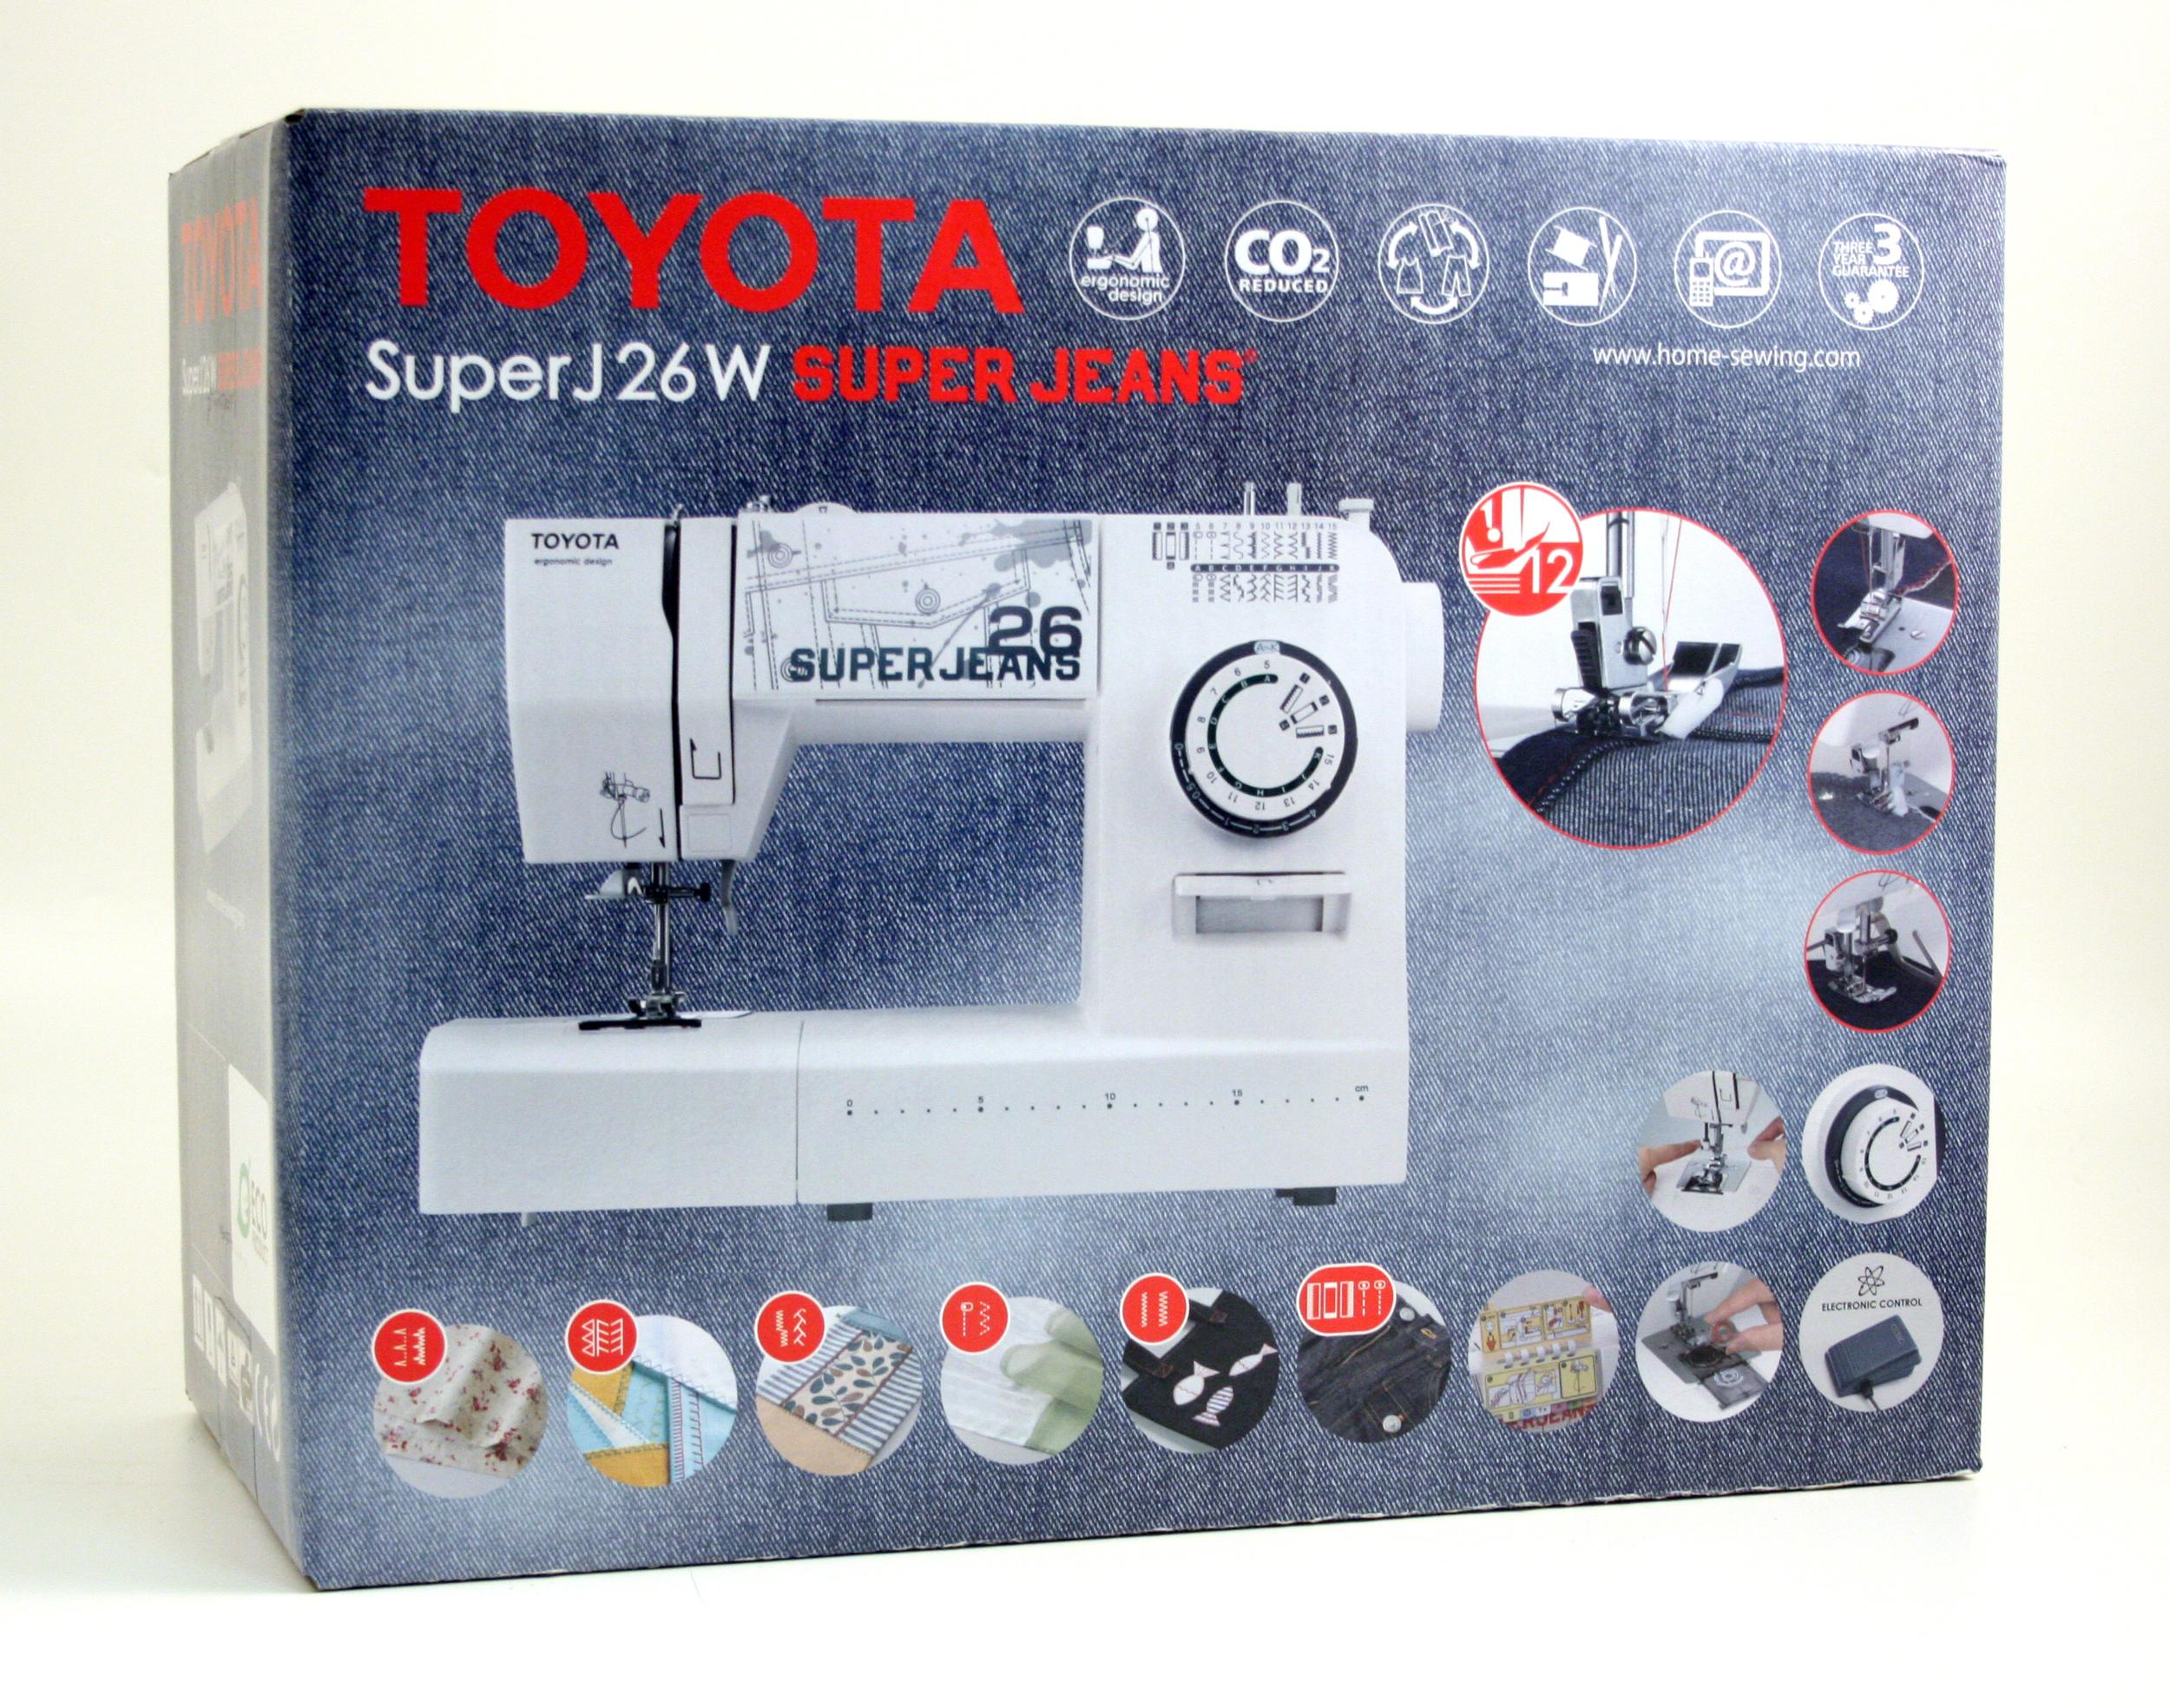 šicí stroj Toyota Super Jeans 26 bílý-8